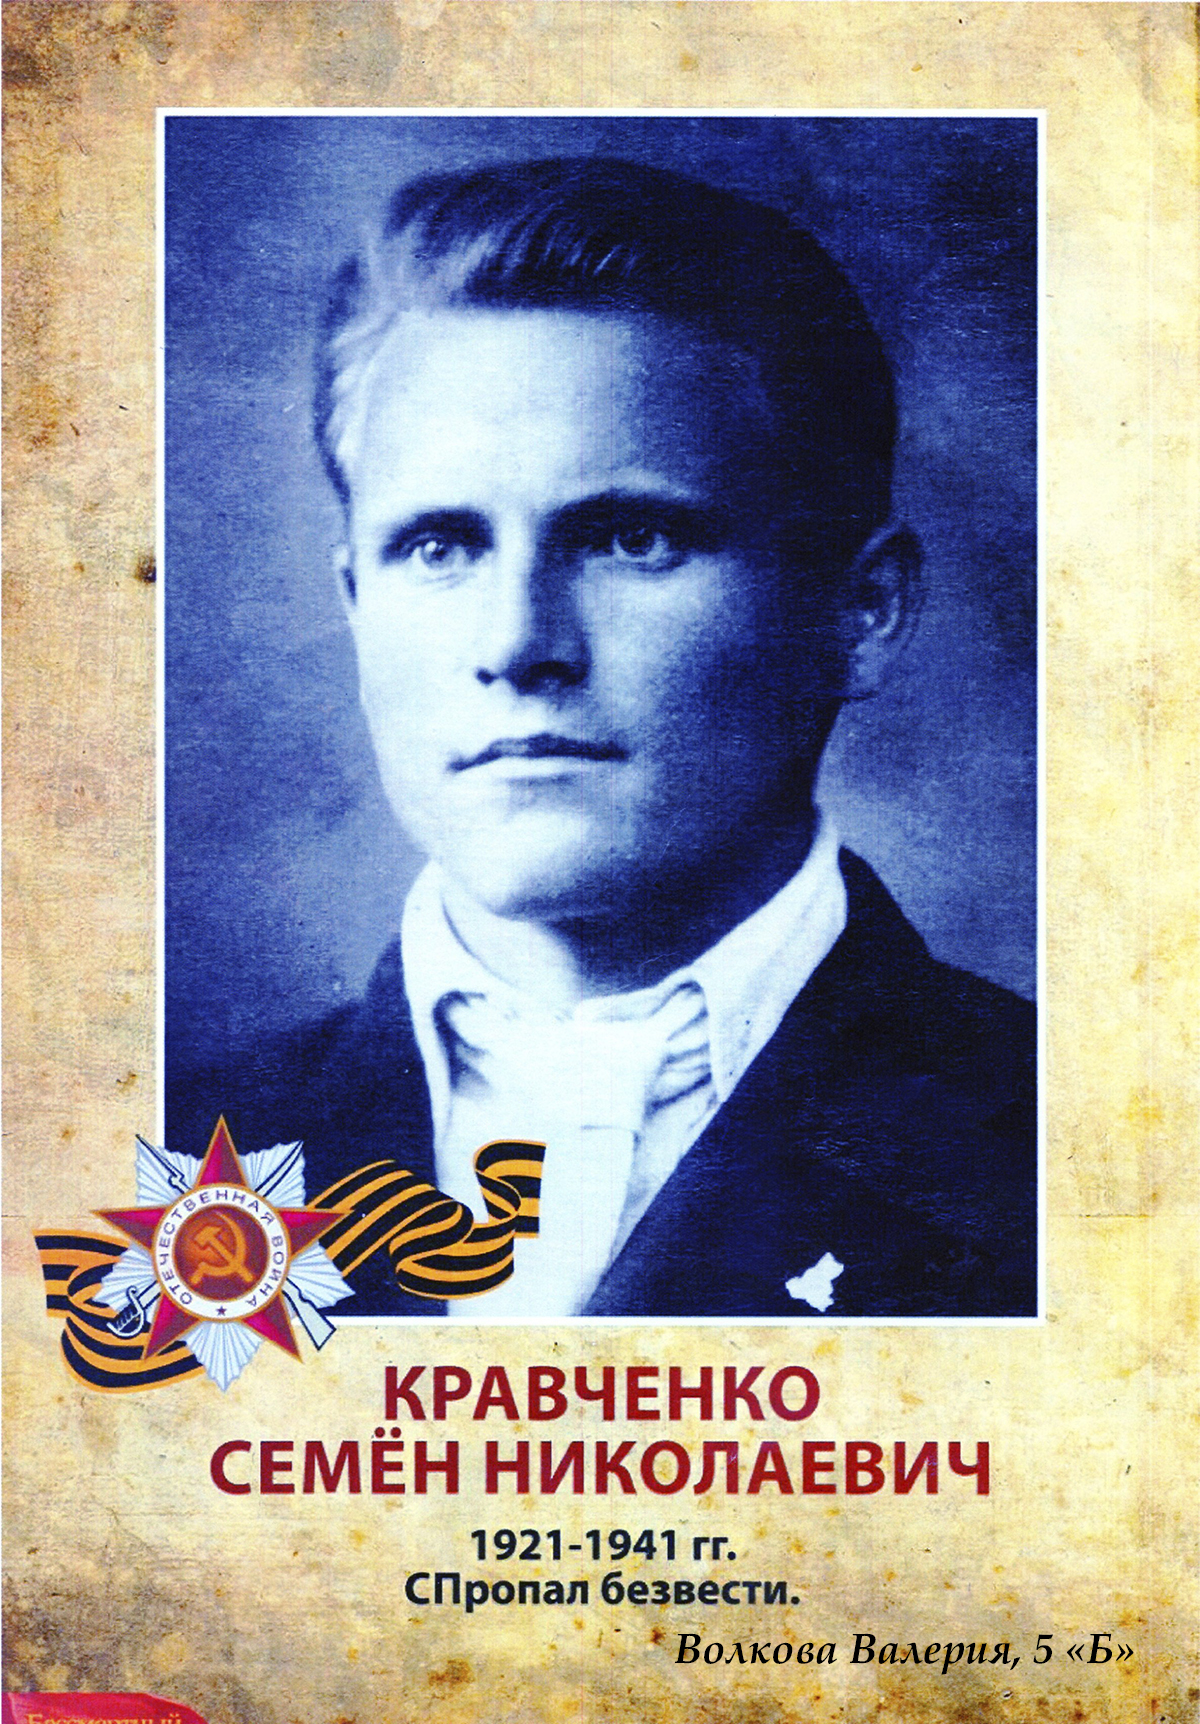 Кравченко С. Н.